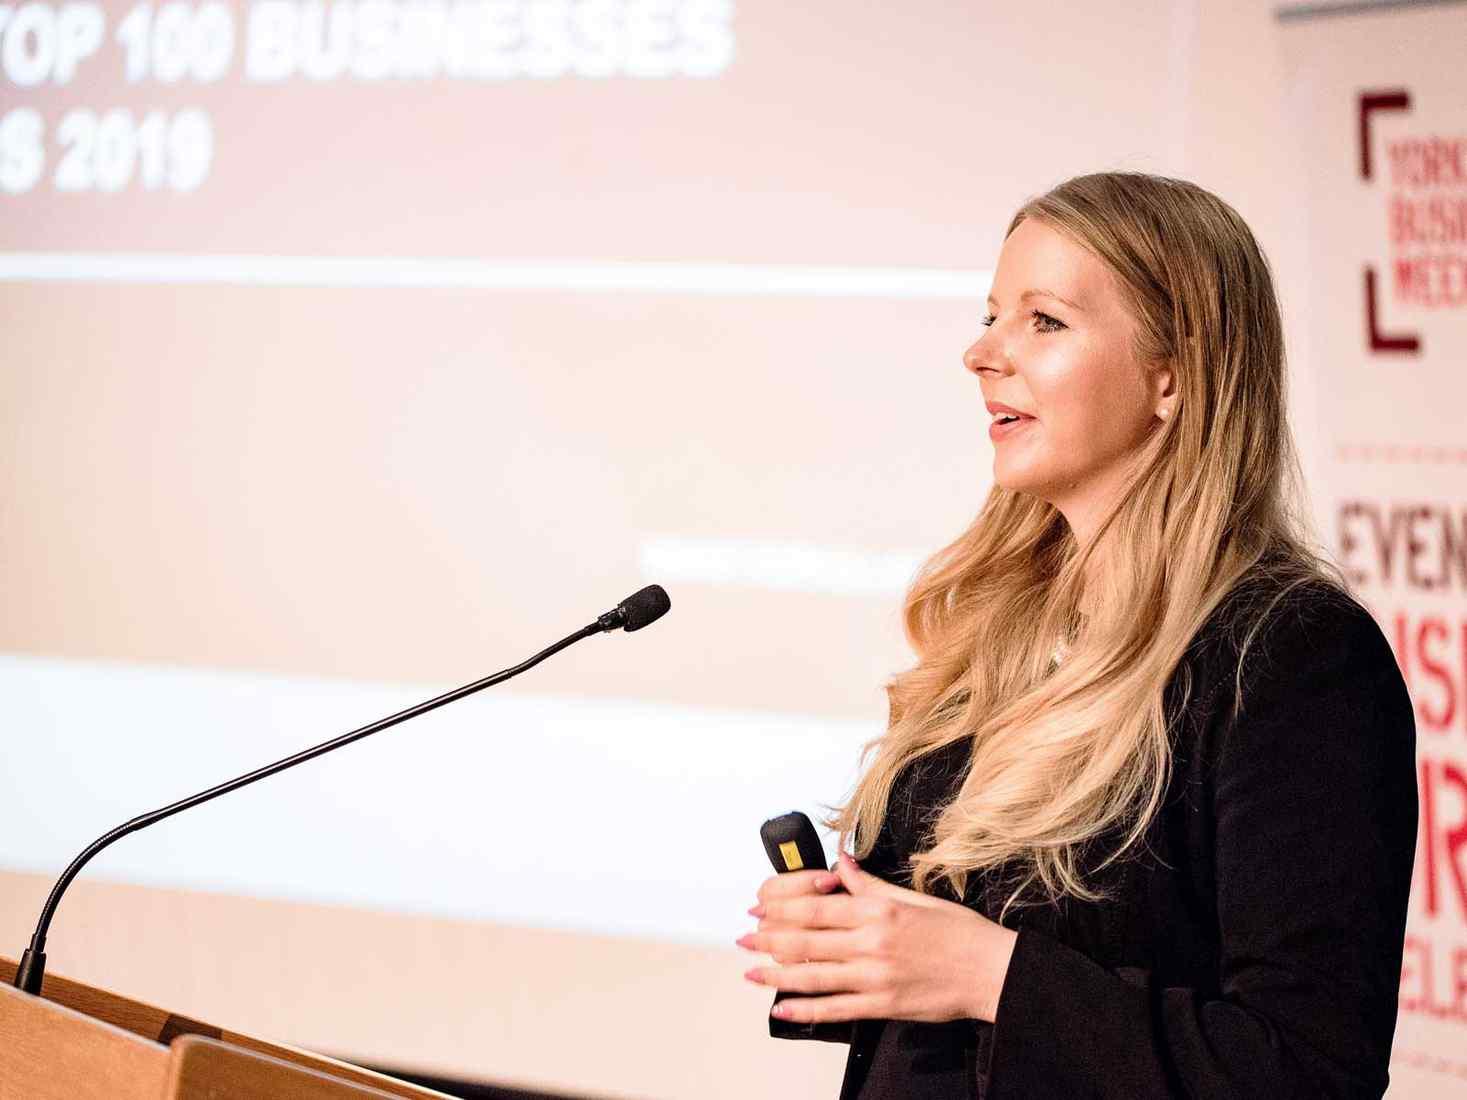 Lecturer Rebecca Biggins stands at a podium presenting at the Top 100 event 2019.